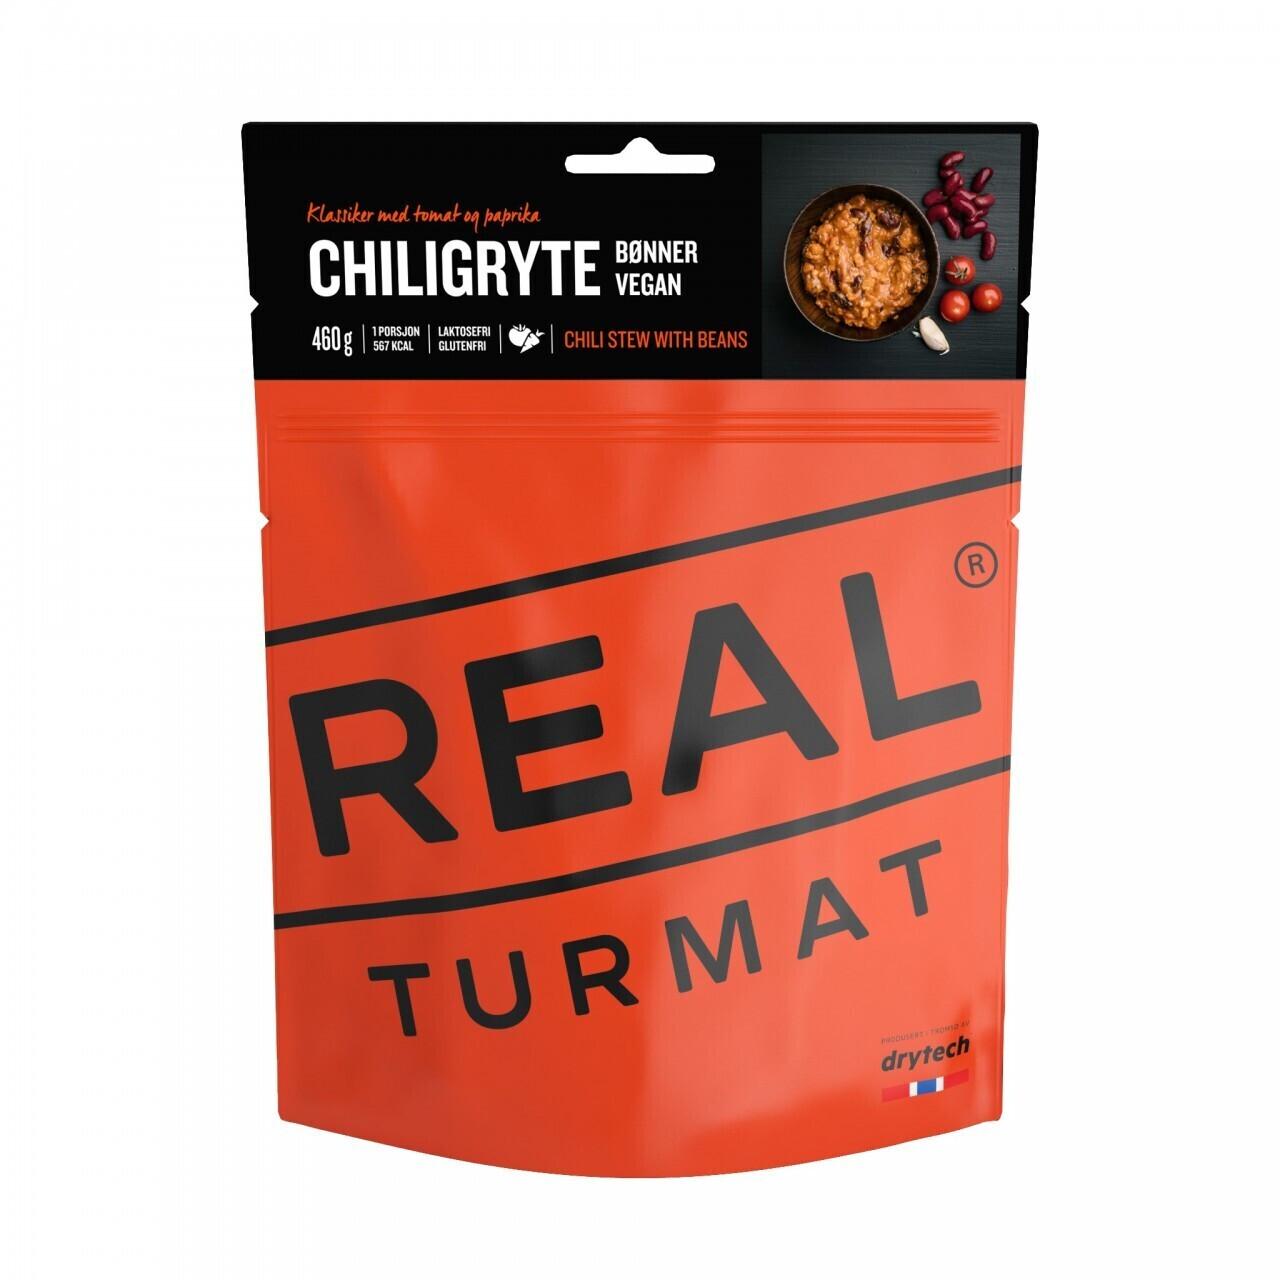 Real Turmat Vegan Chili Stew With Beans - Chili-Eintopf (132g)